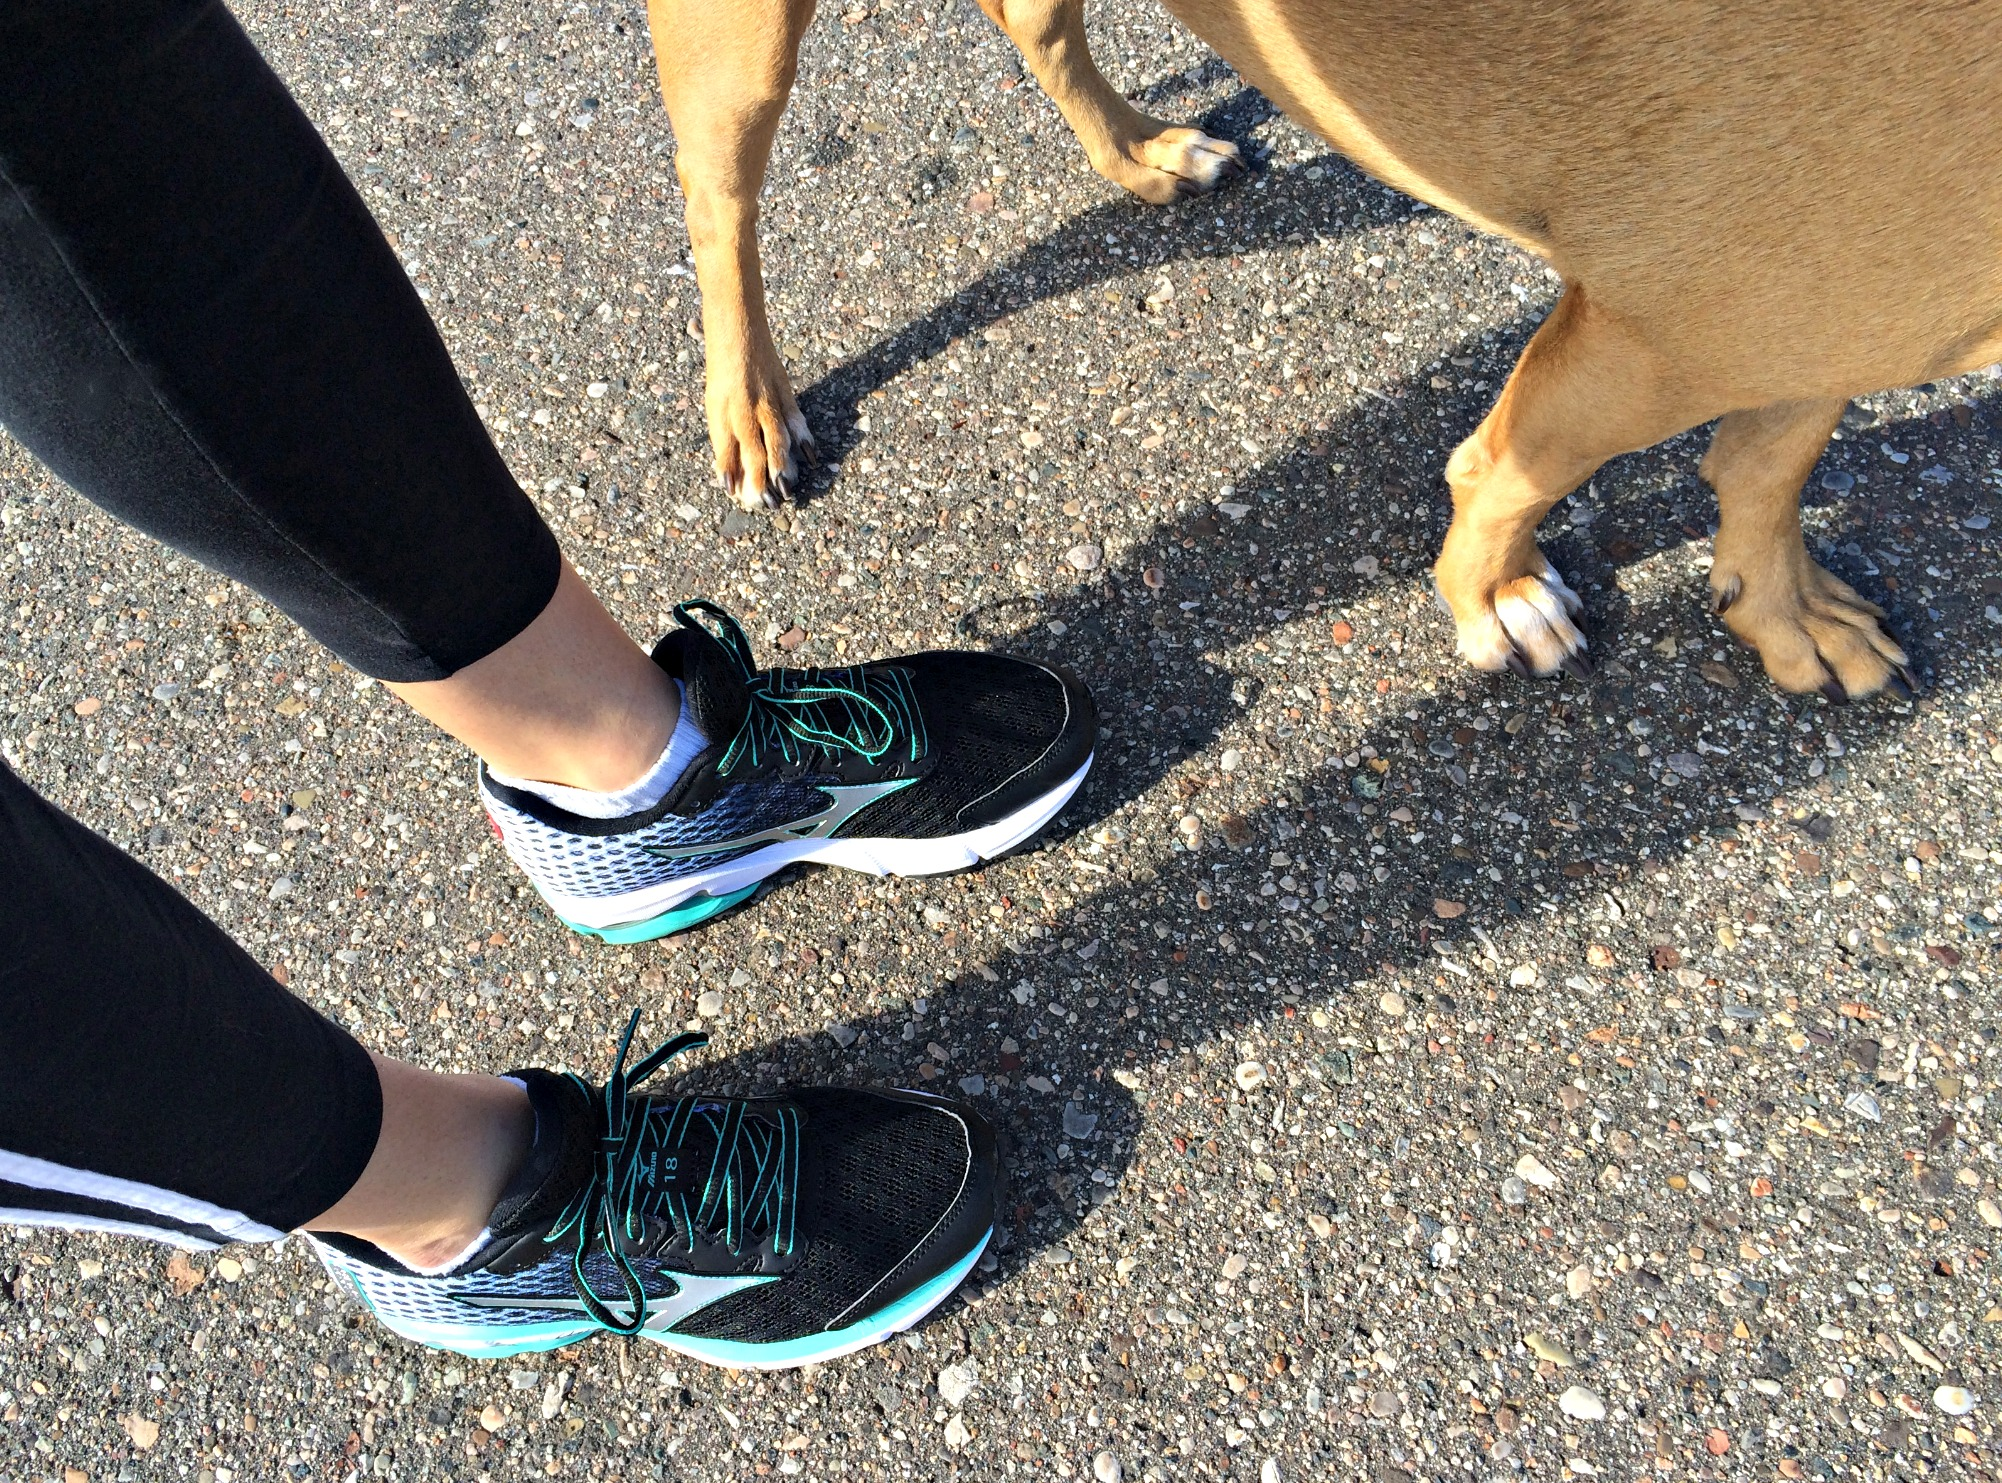 Training Run in Mizuno WaveRunner18 sneakers Thursday